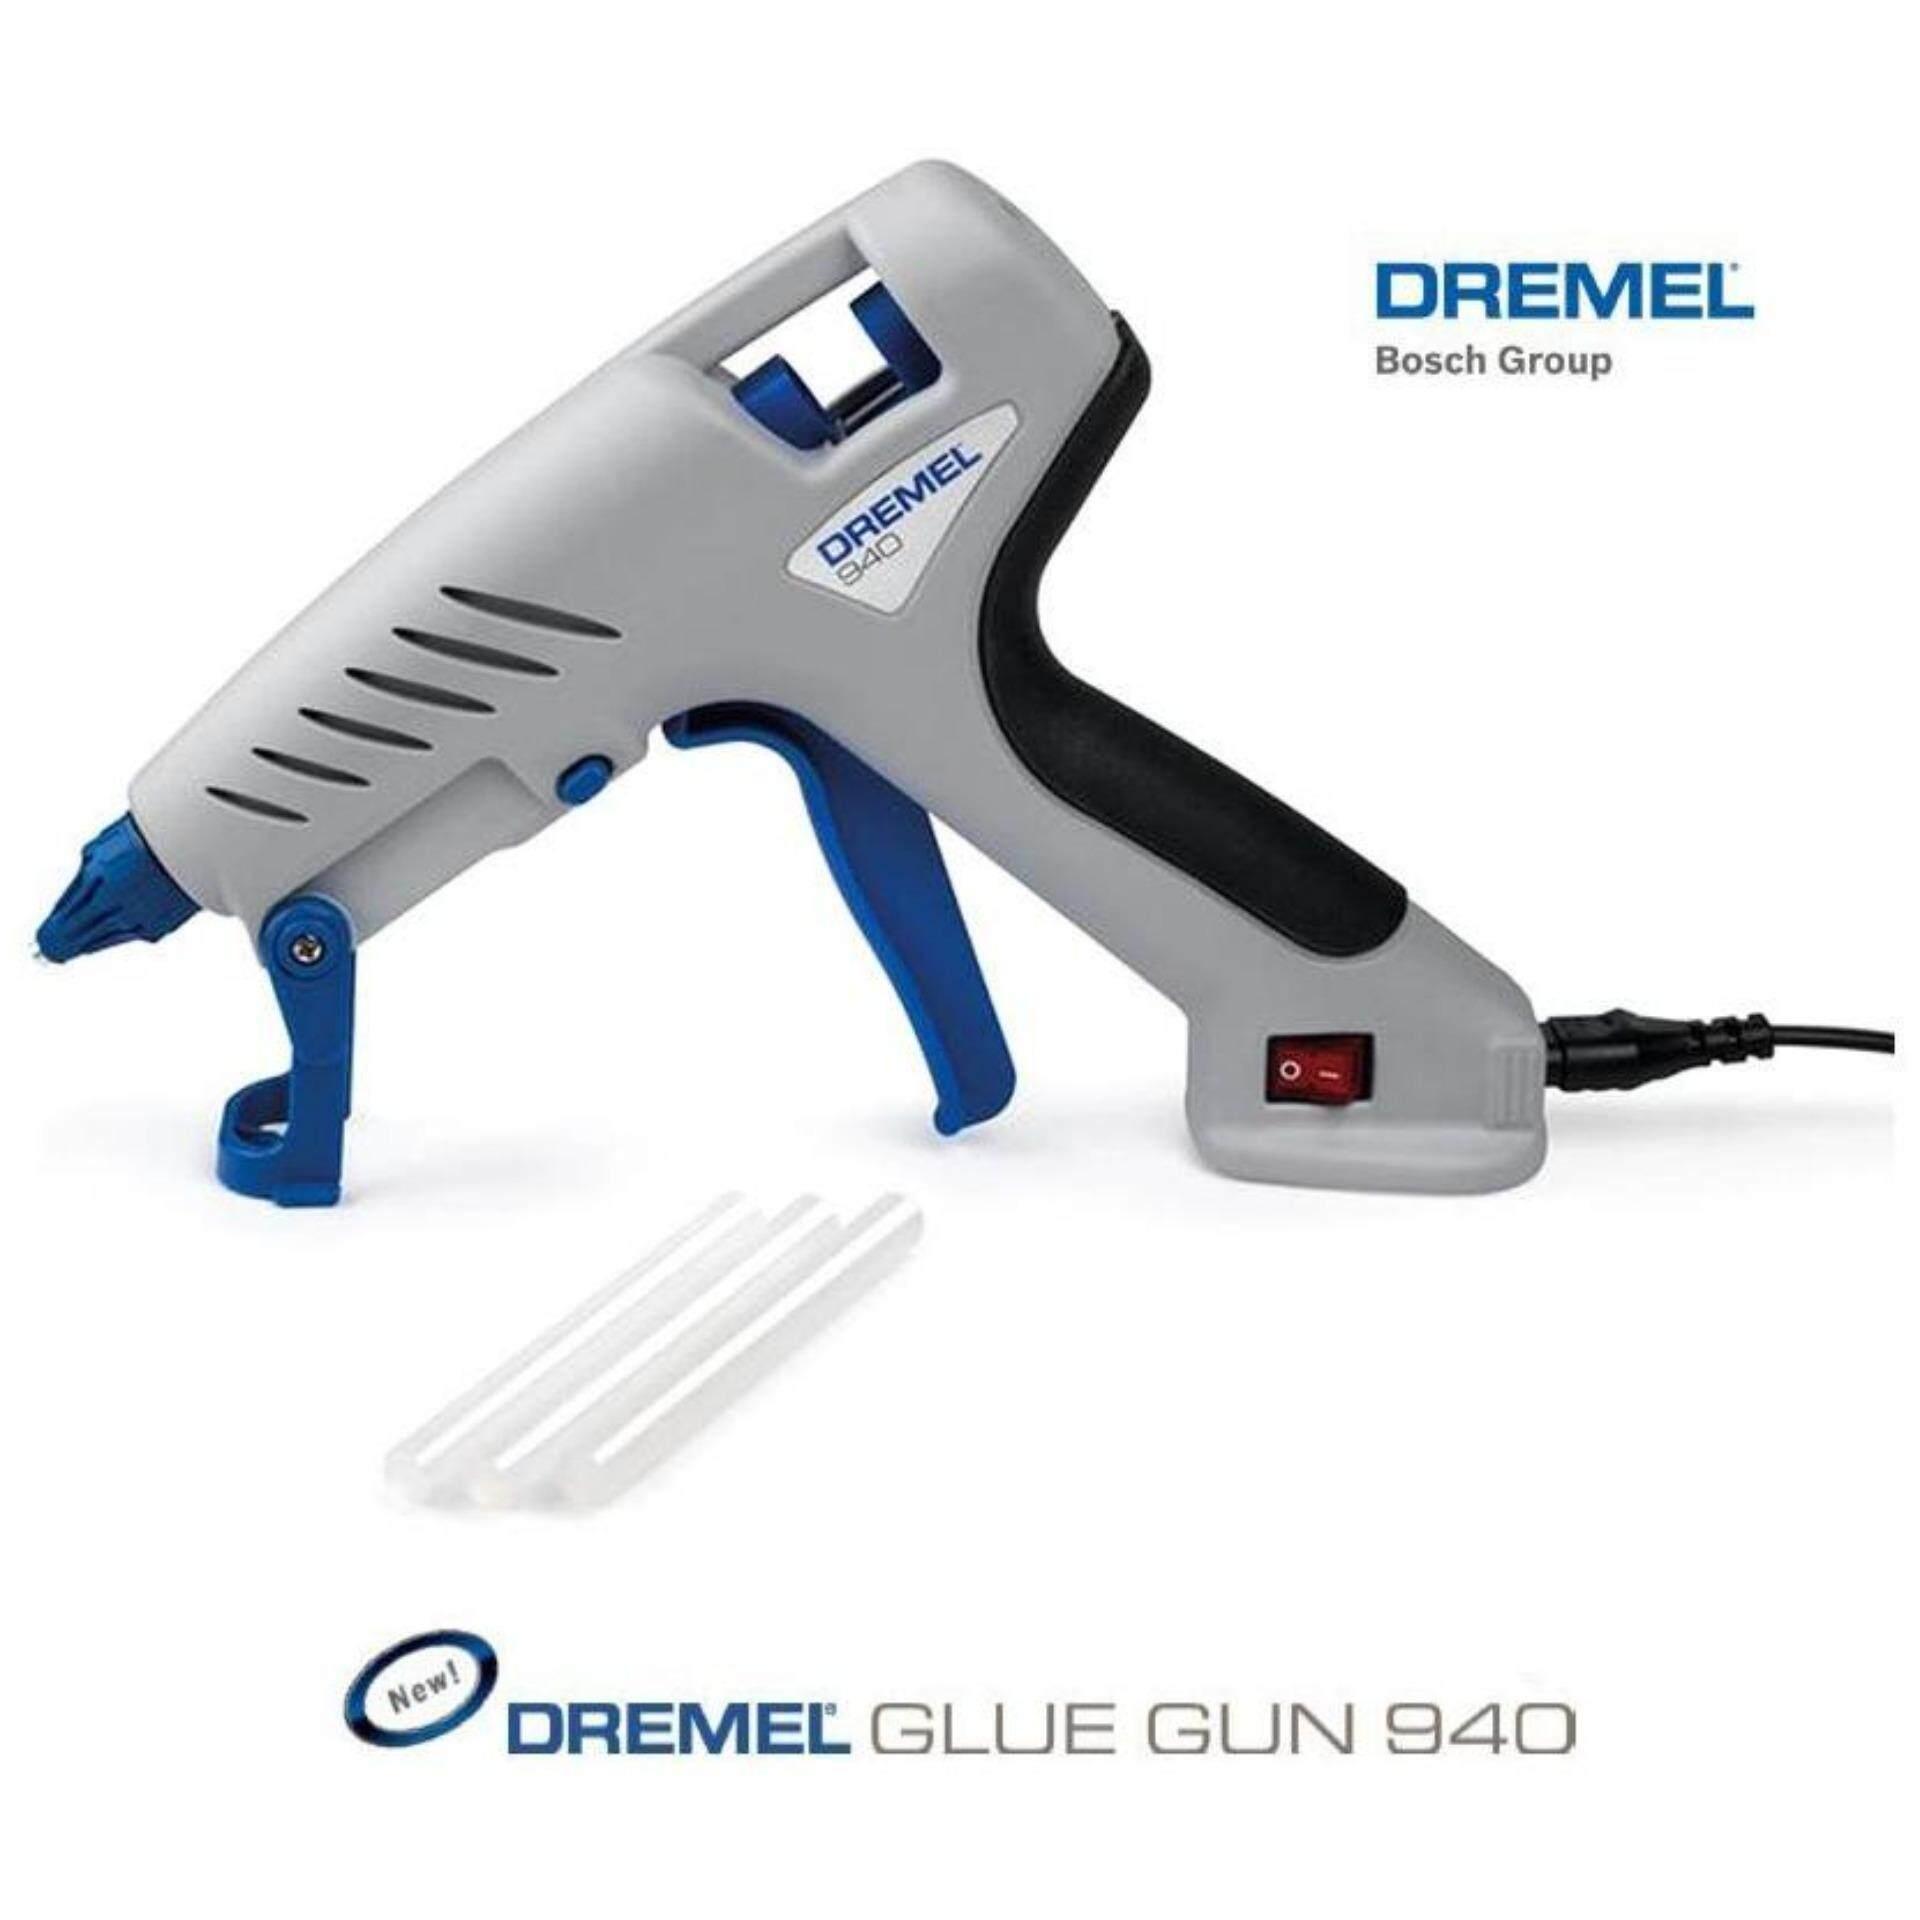 DREMEL ปืนกาว รุ่น GLUE GUN 940 - สีเทา